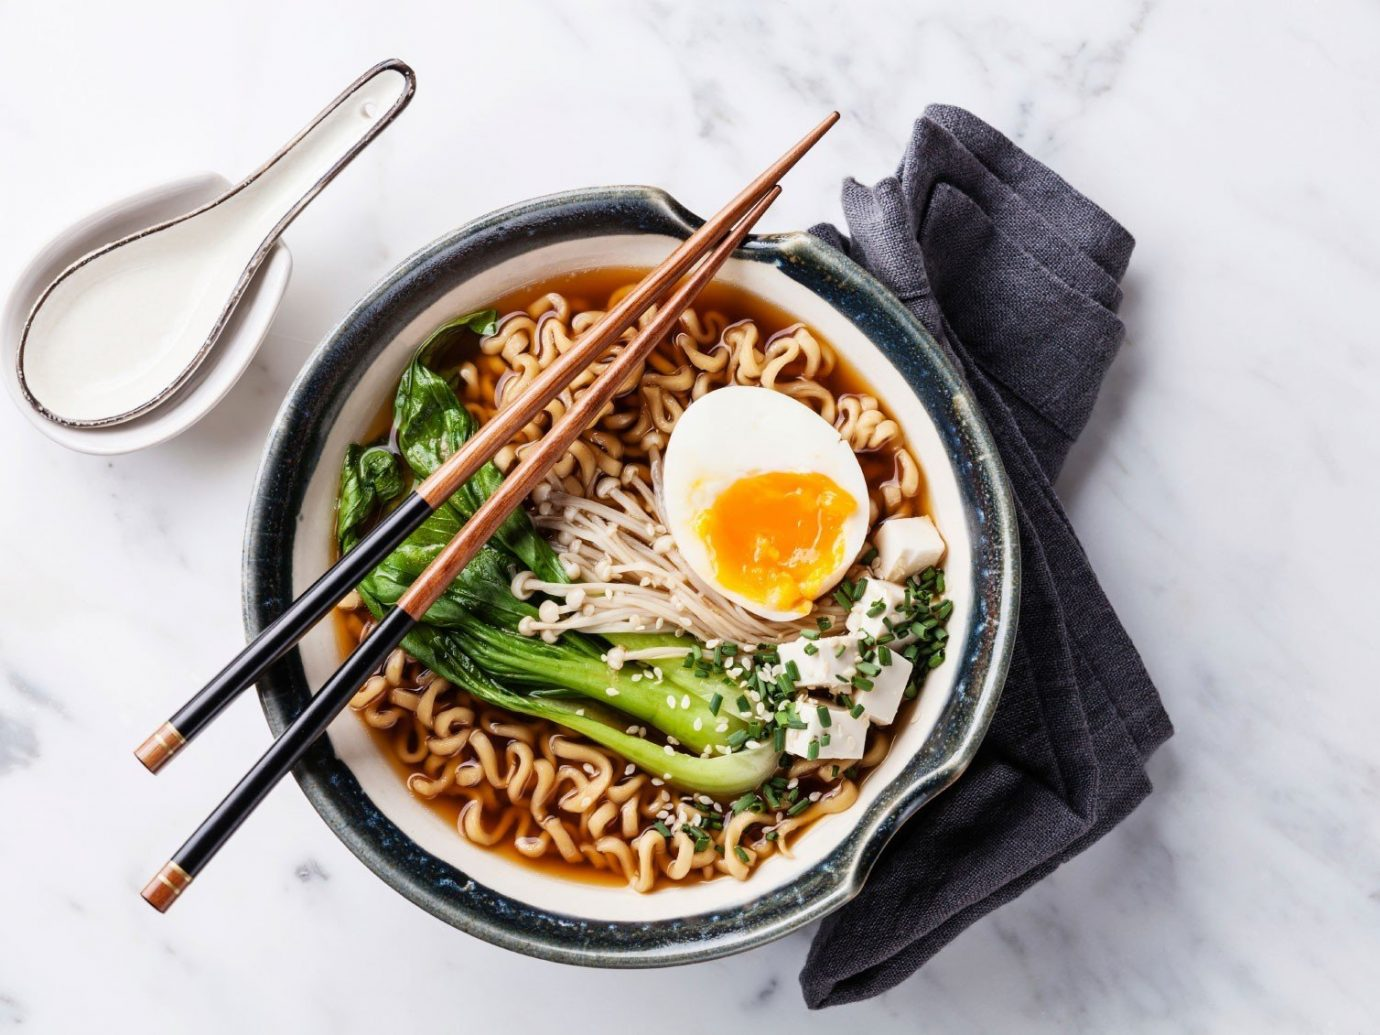 Food + Drink dish food cuisine asian food meal produce vegetable